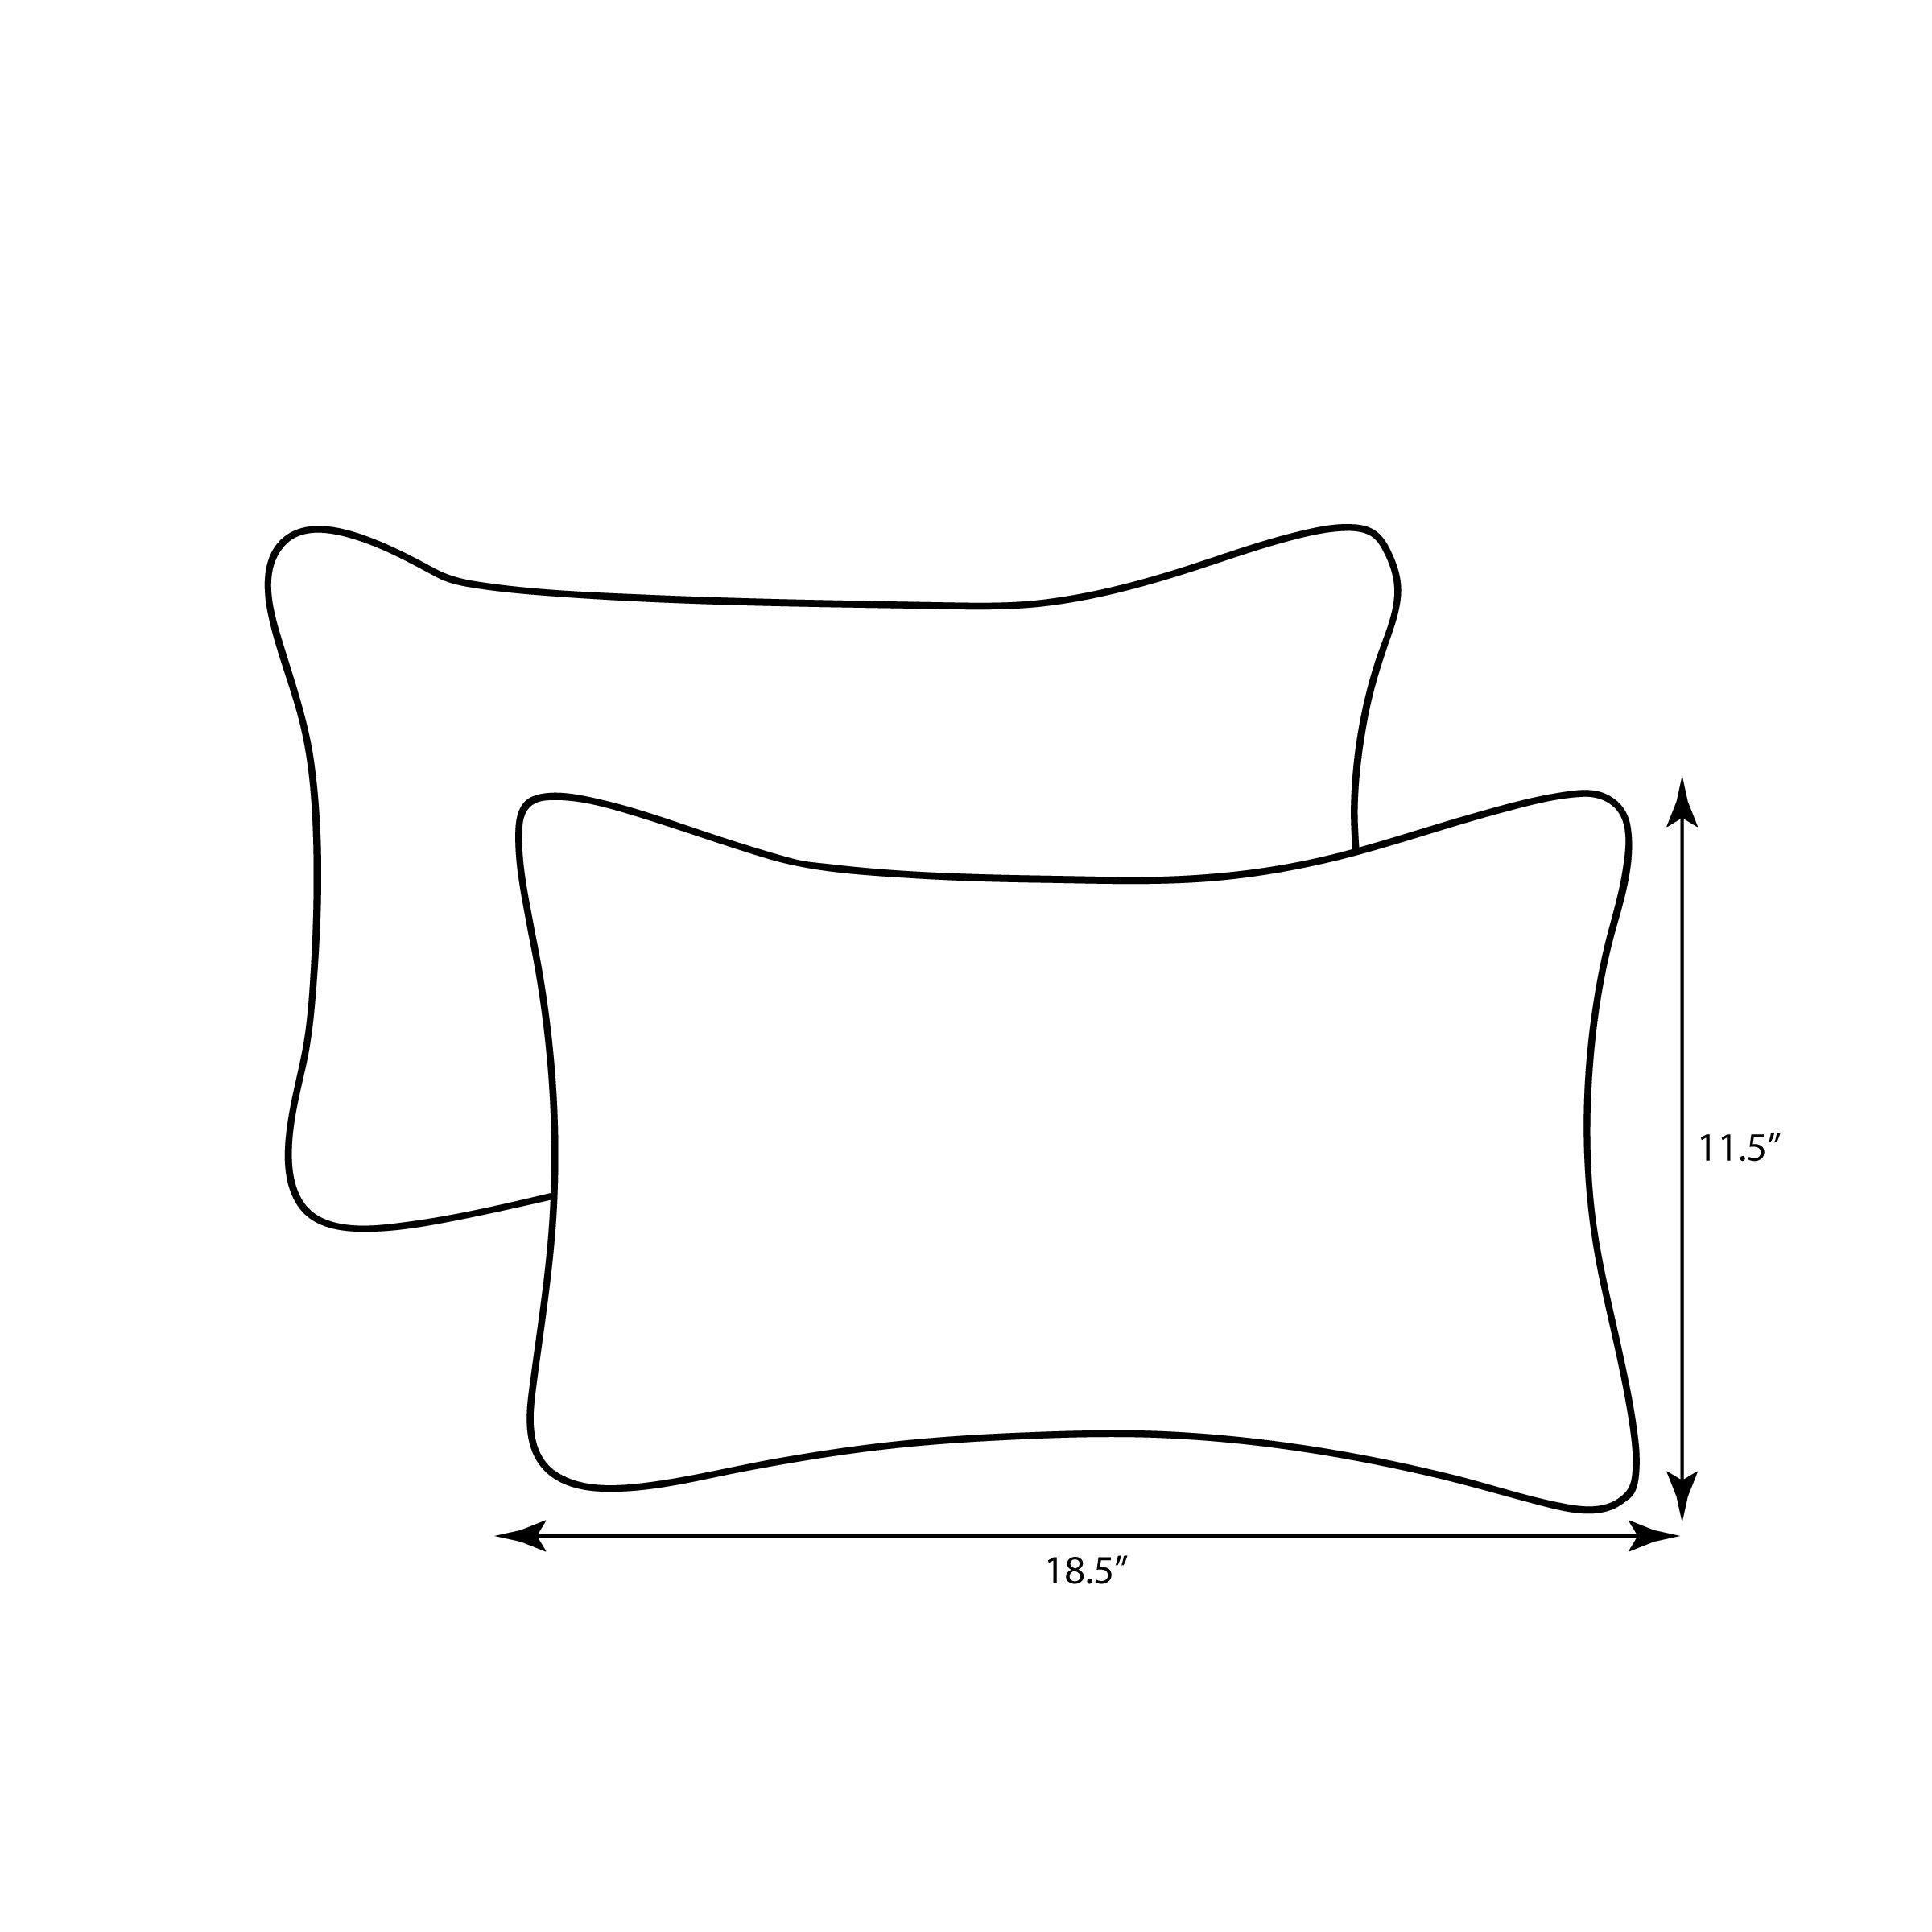 Pillow Perfect Outdoor Fresco Corded Rectangular Throw Pillow, Black, Set of 2 by Pillow Perfect (Image #3)